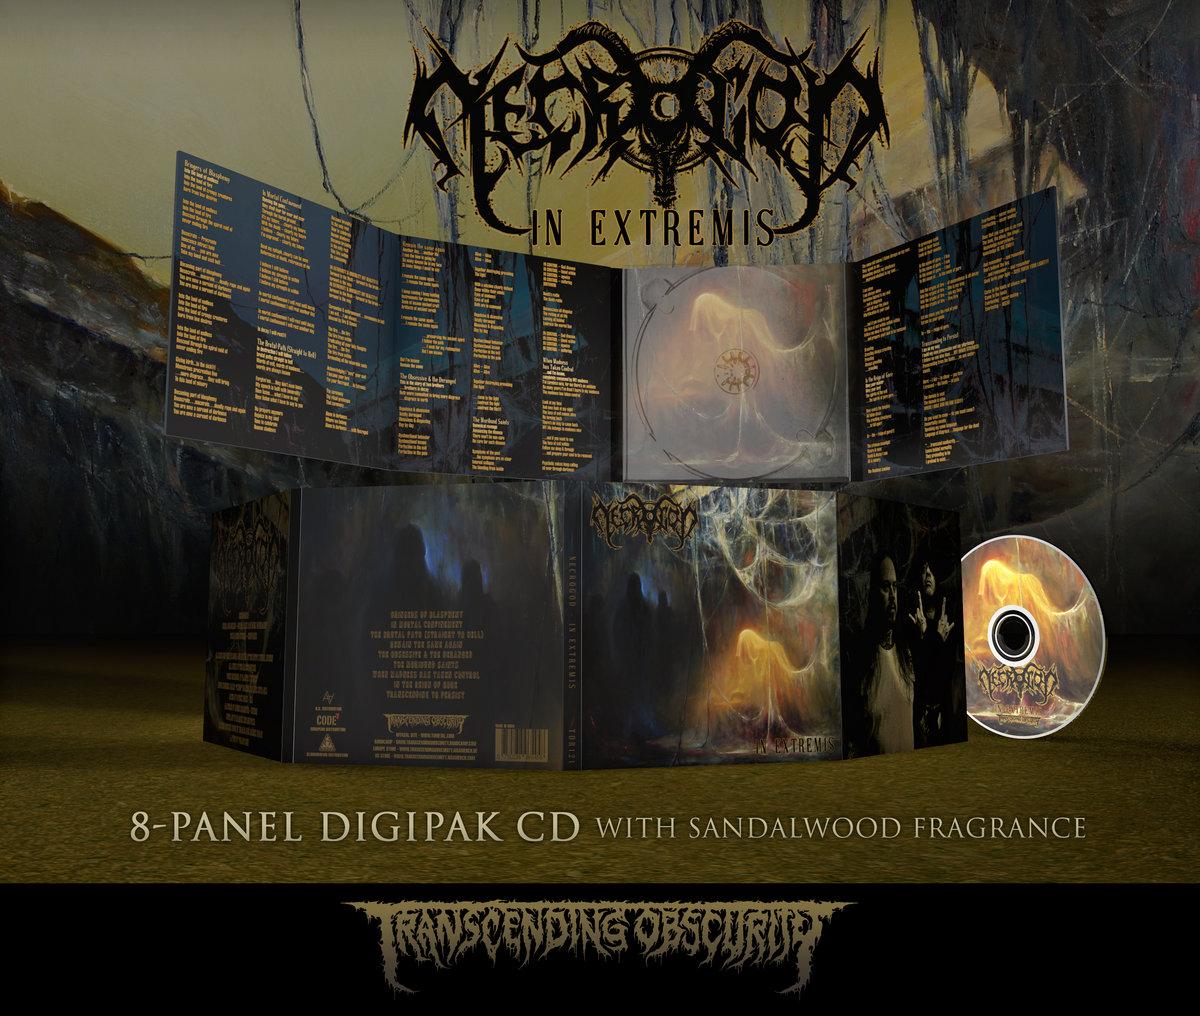 NECROGOD - In Extremis 8-Panel Digipak CD with Sandalwood Fragrance